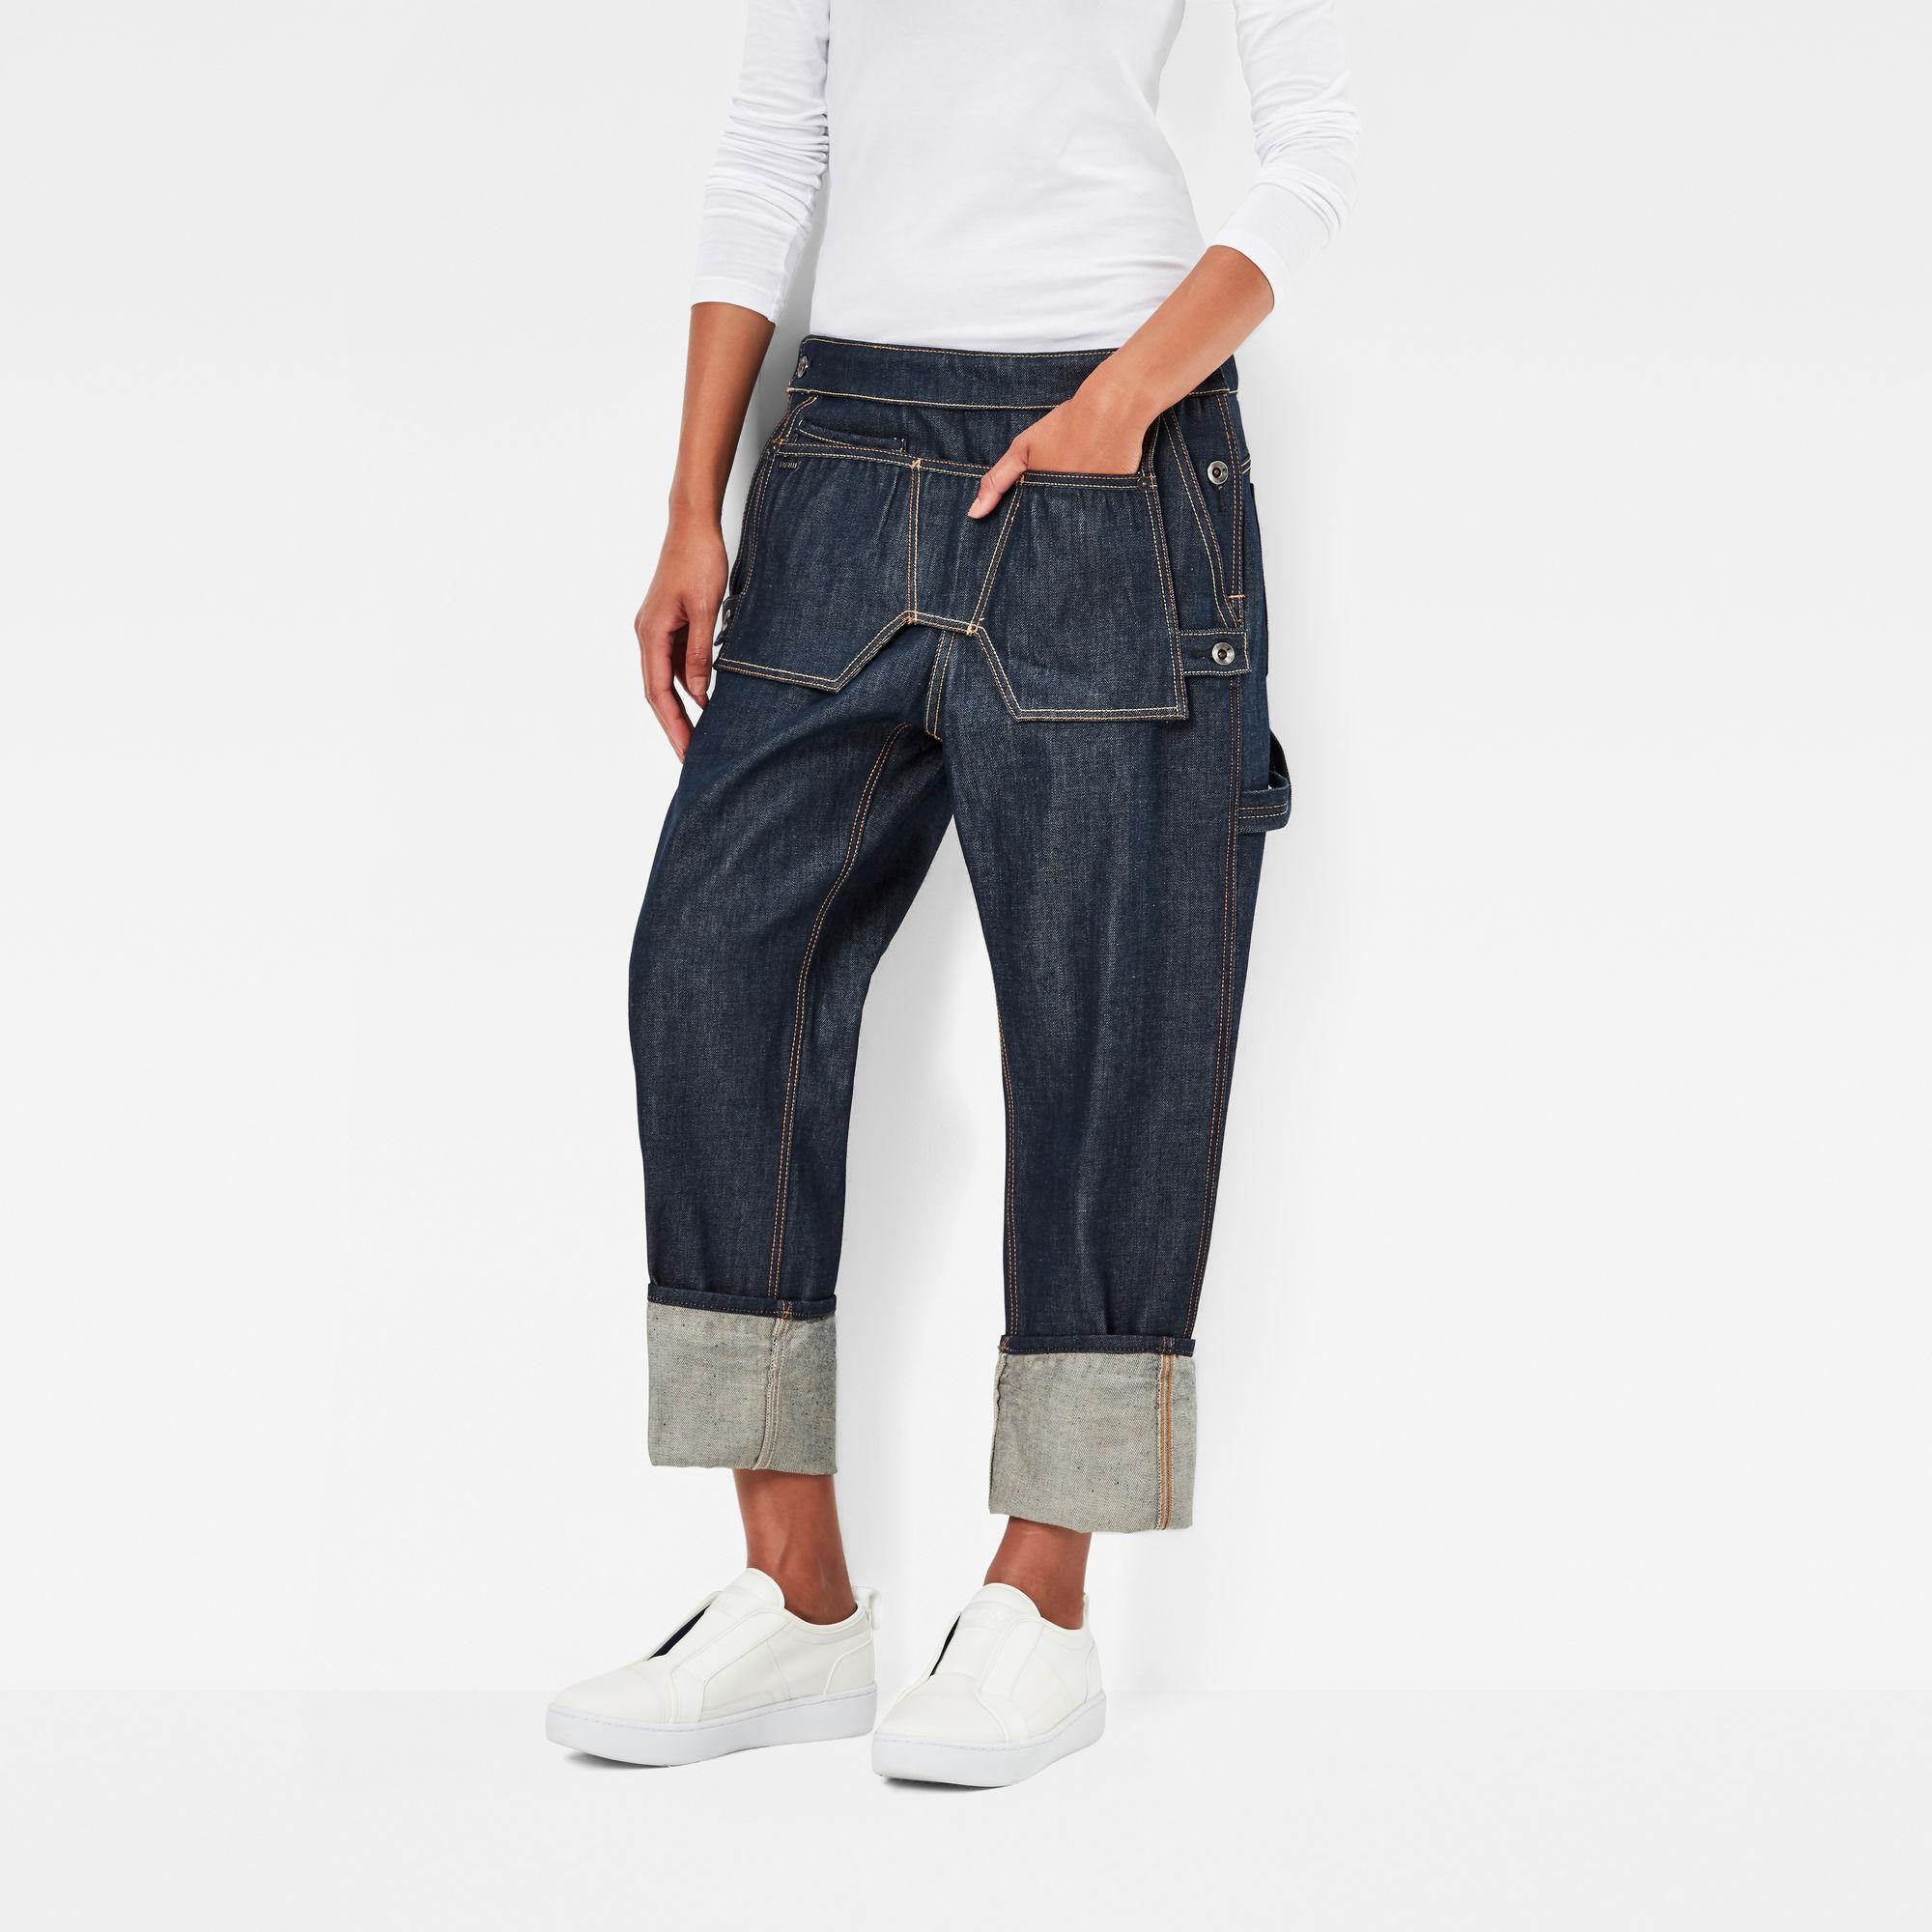 Midge MP Low Waist Boyfriend Jeans